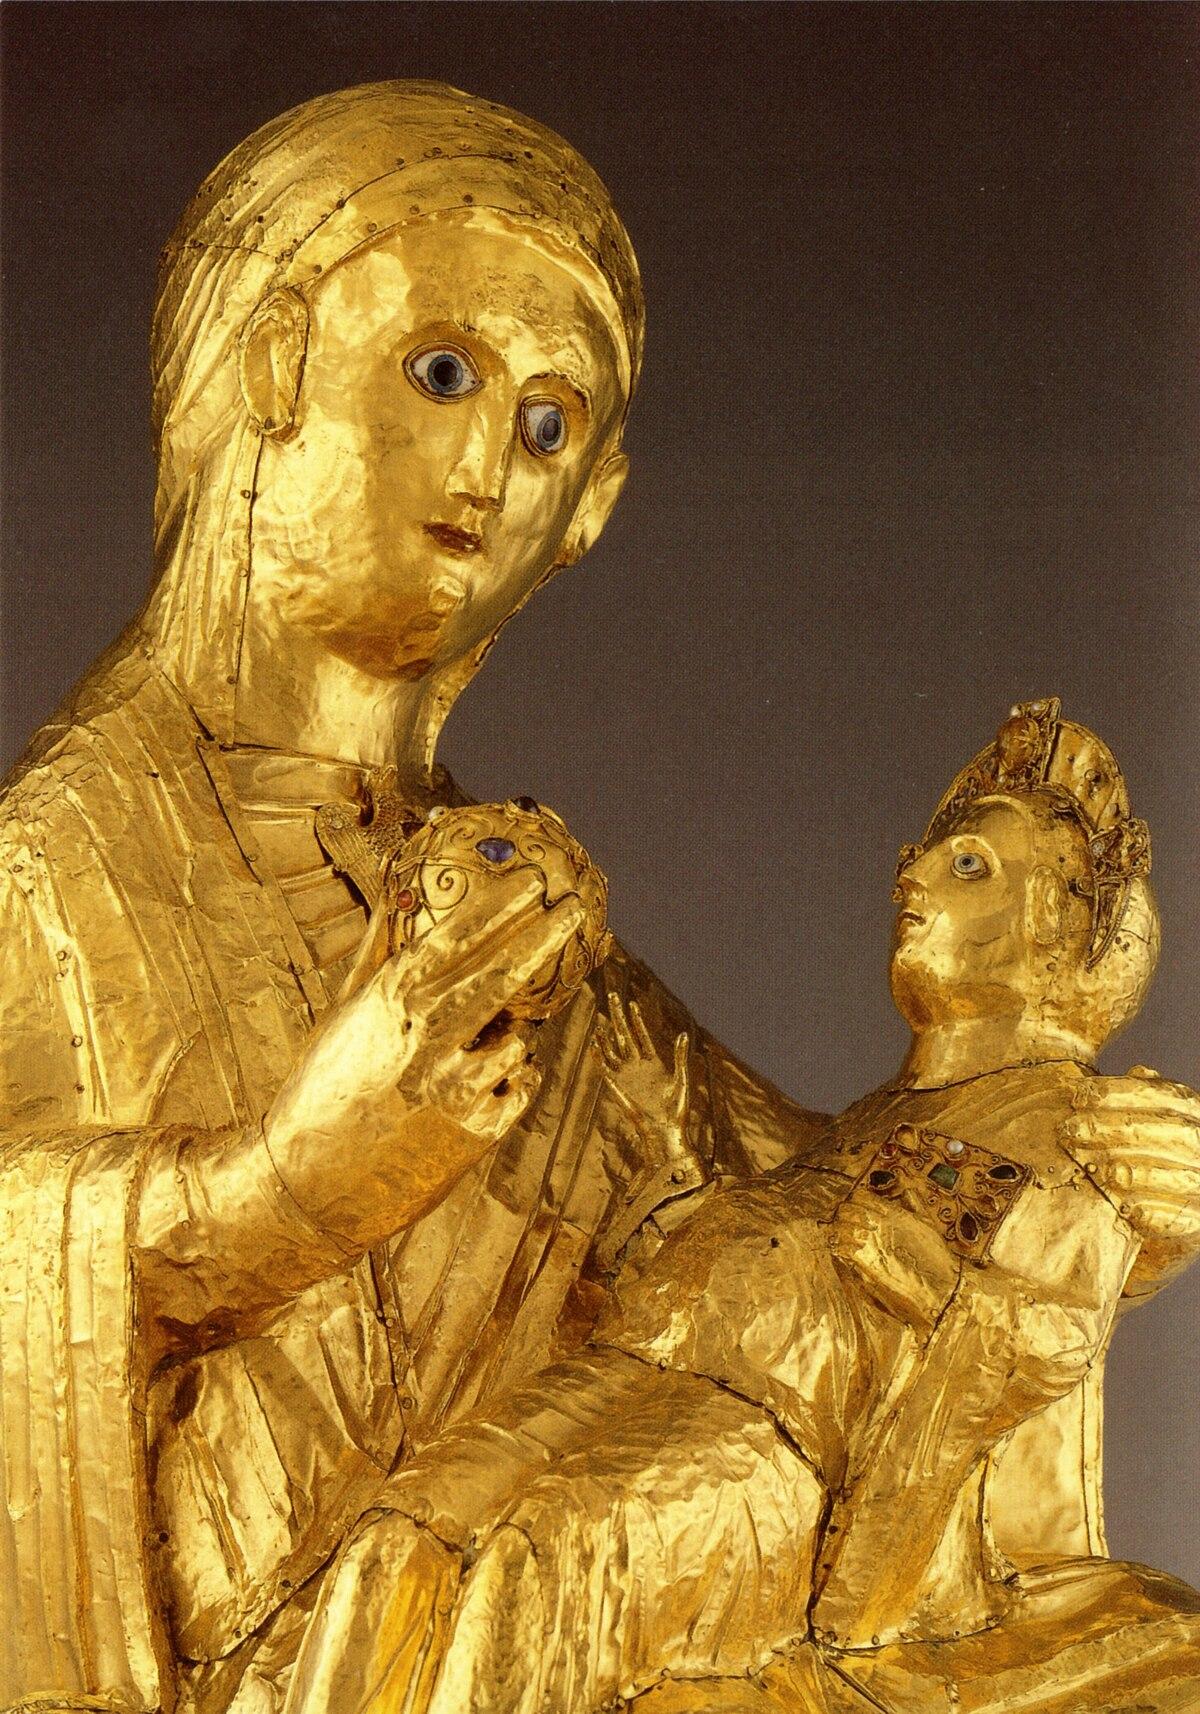 Golden madonna of essen wikipedia for Z portal